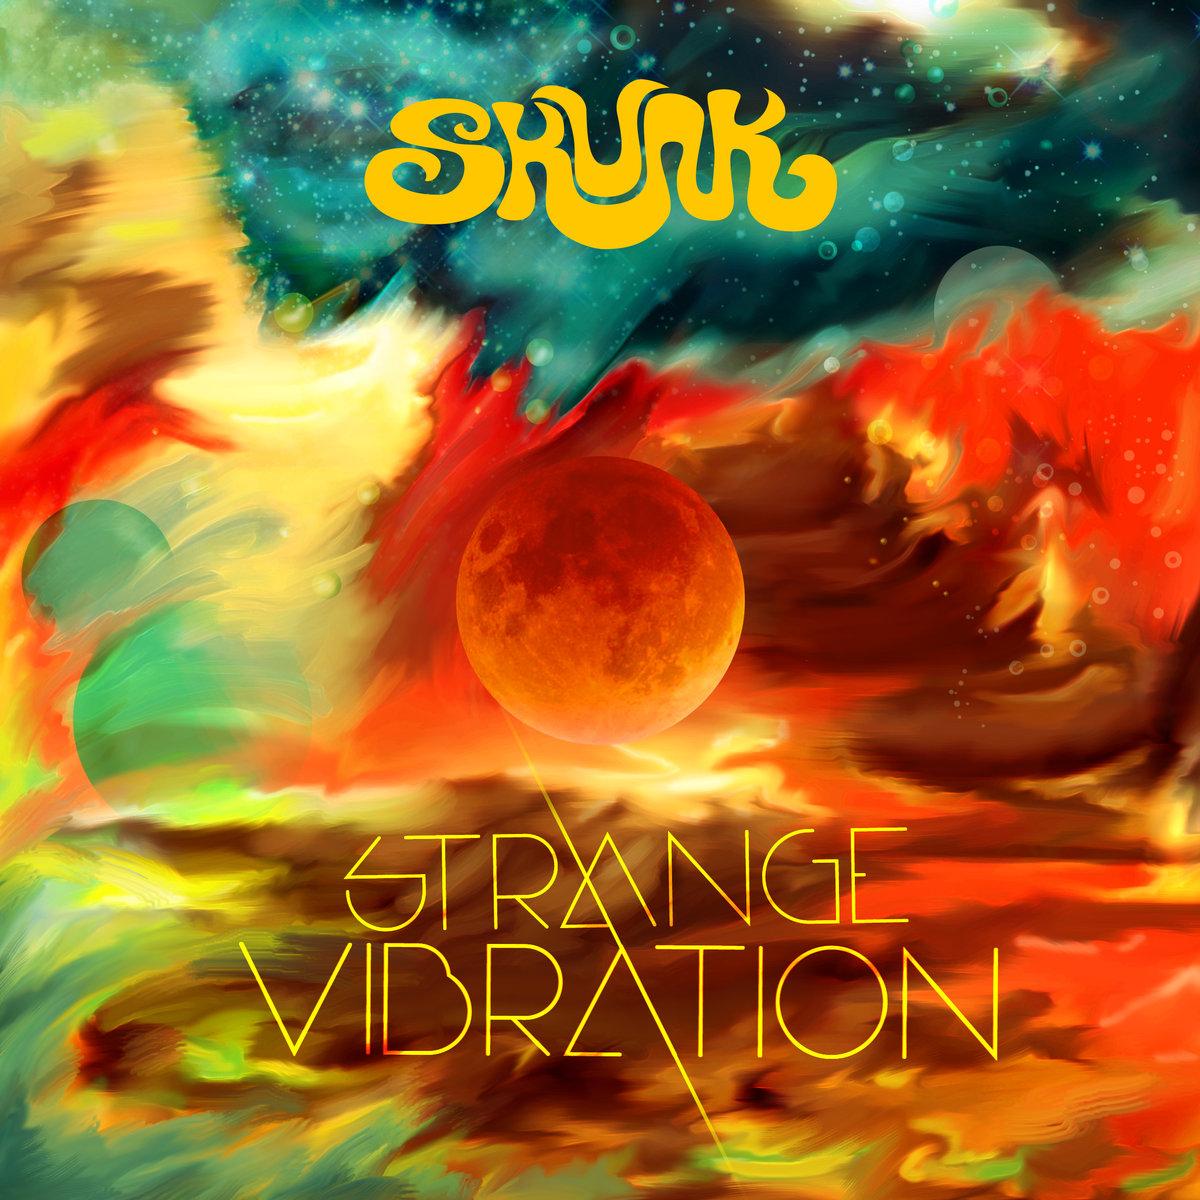 skunk strange vibration